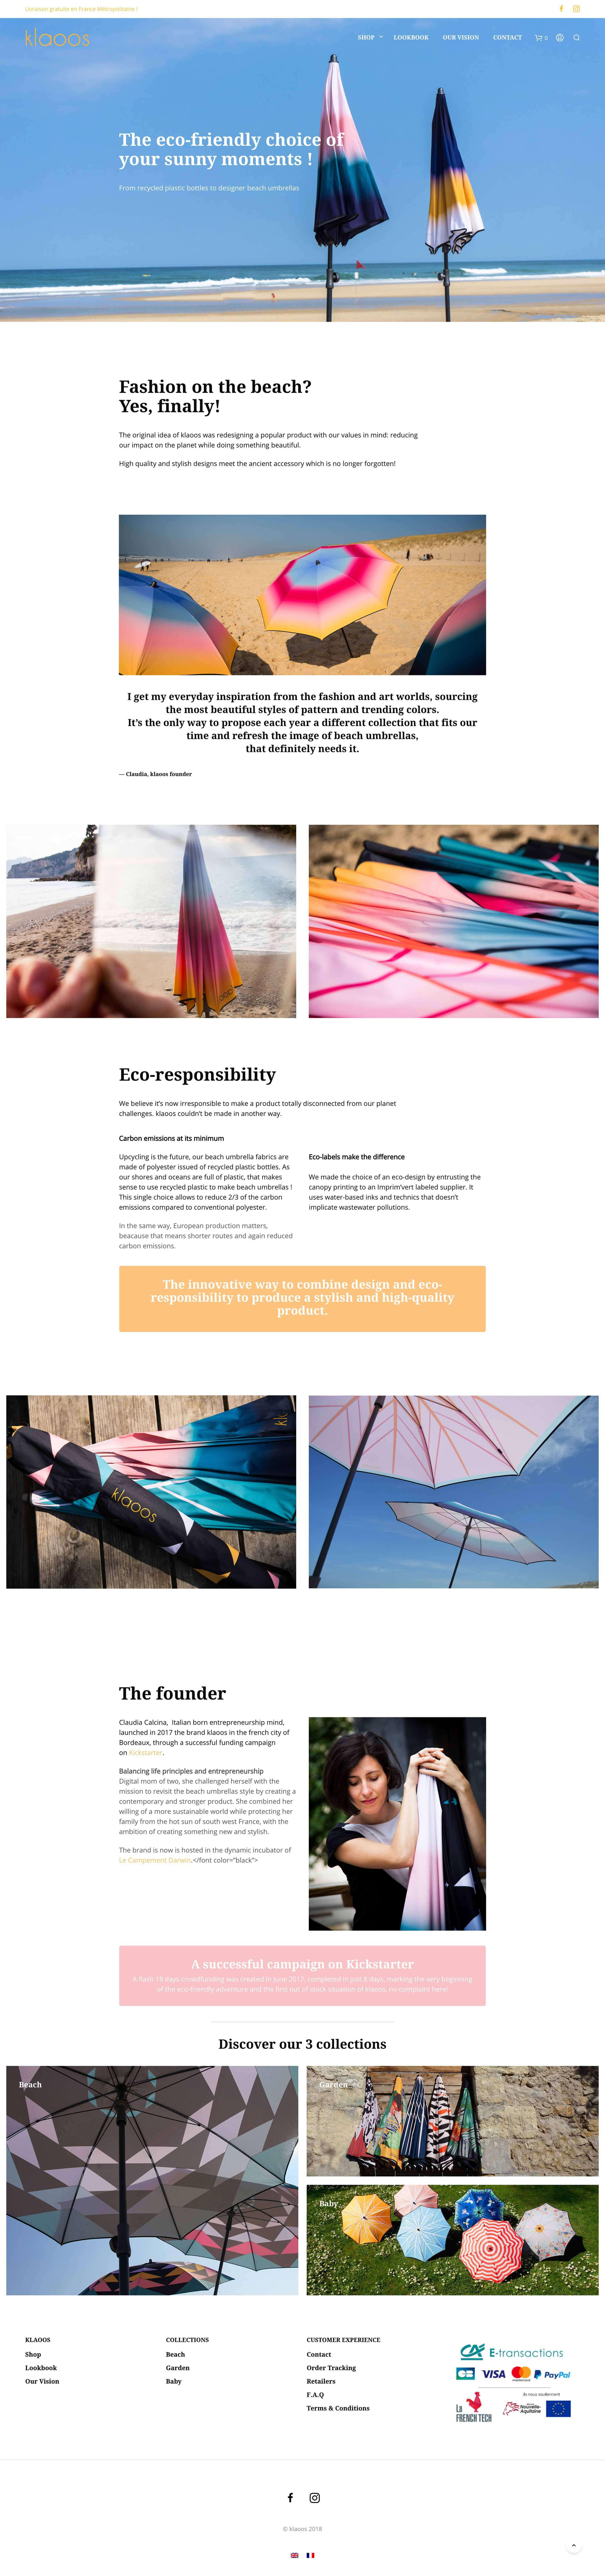 supercausette-klaoos-site-vision